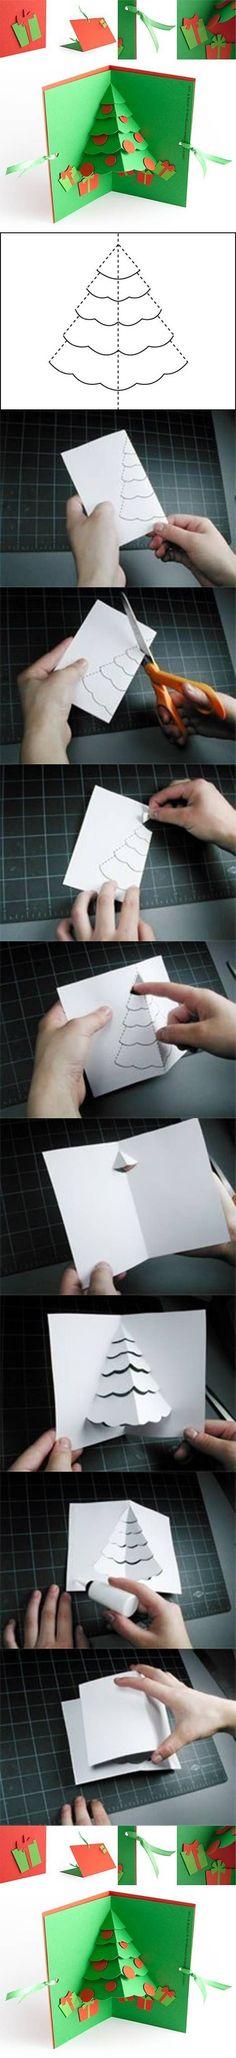 DIY Christmas Tree Pop Up Card DIY Christmas Tree Pop Up Card